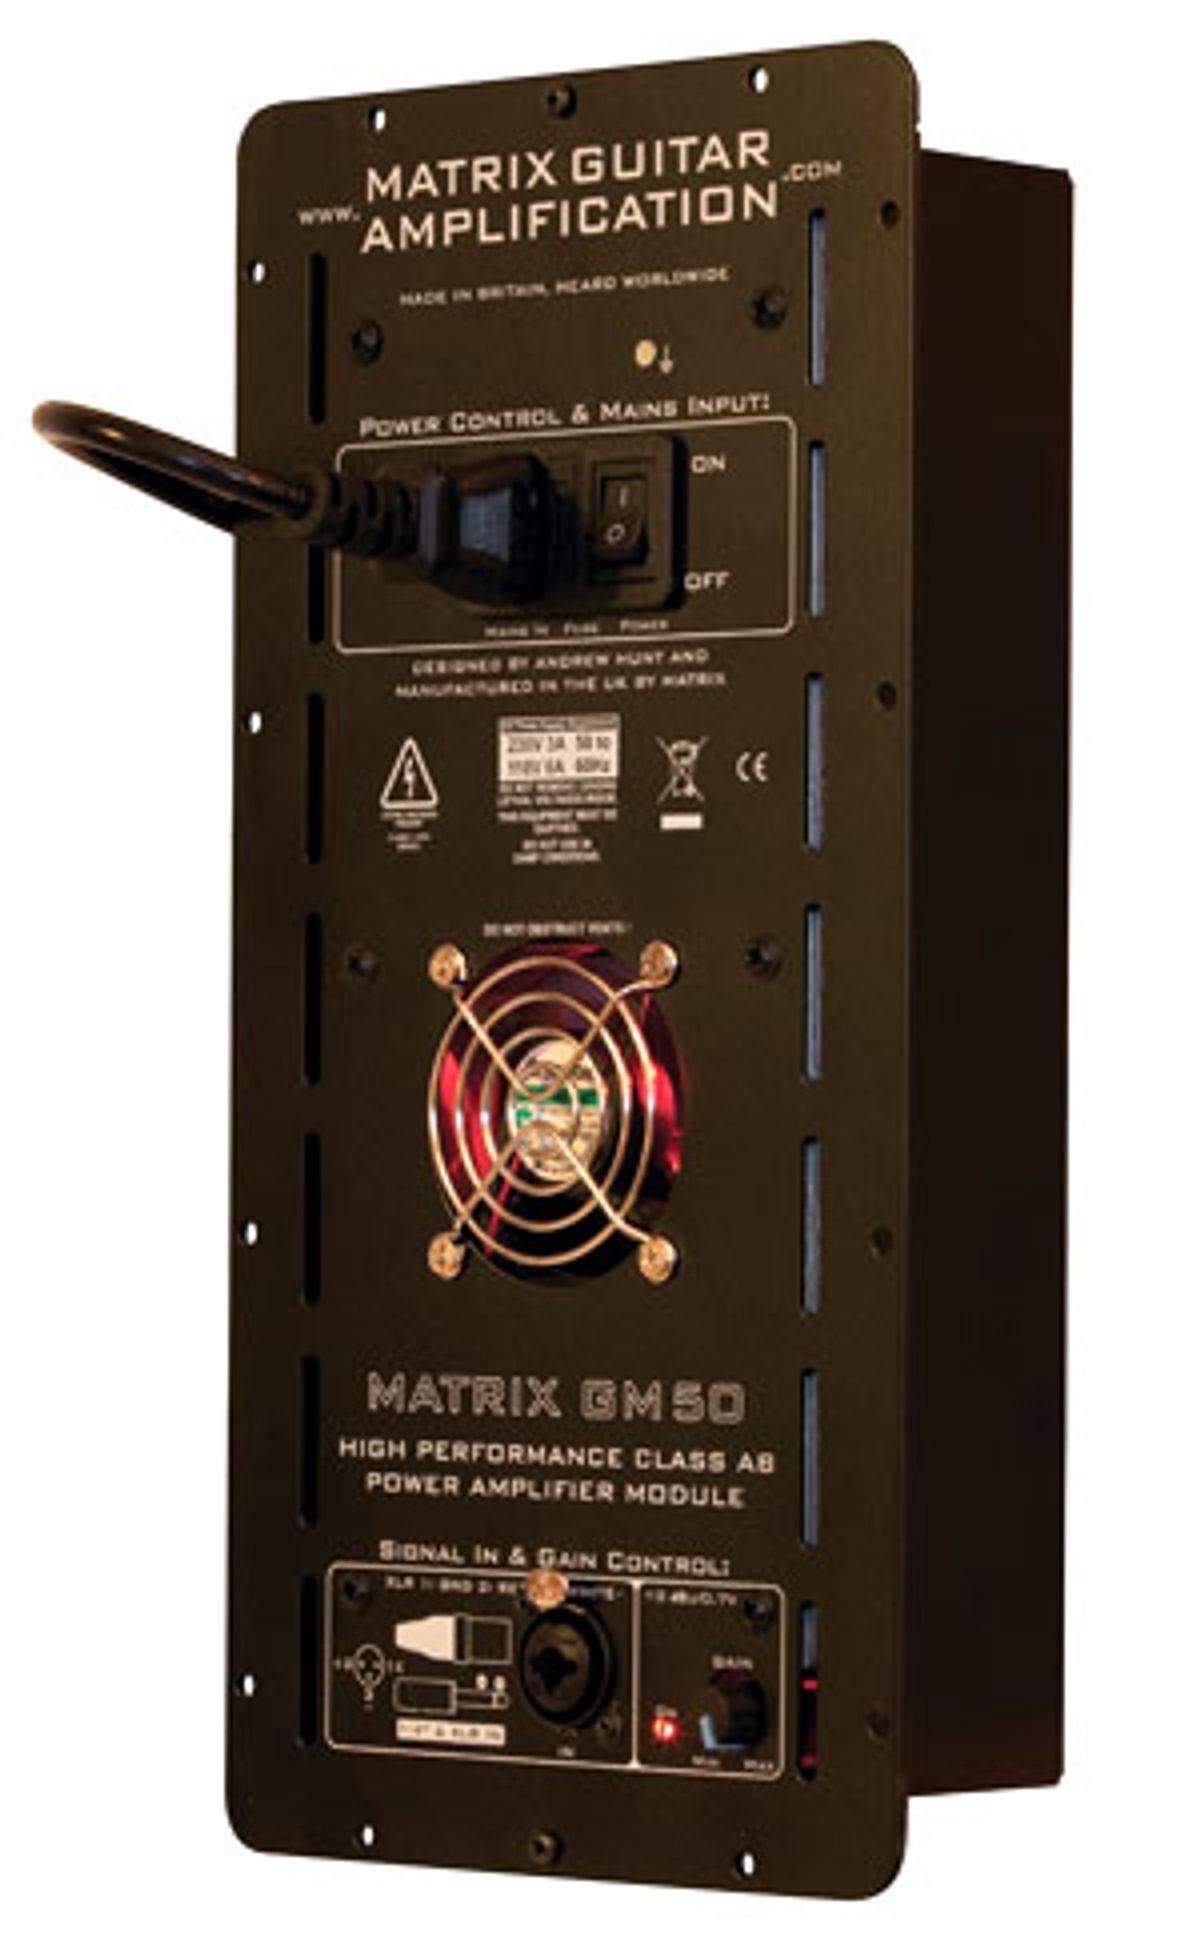 Matrix Guitar Amplification Releases the GM50 Power Amp Module